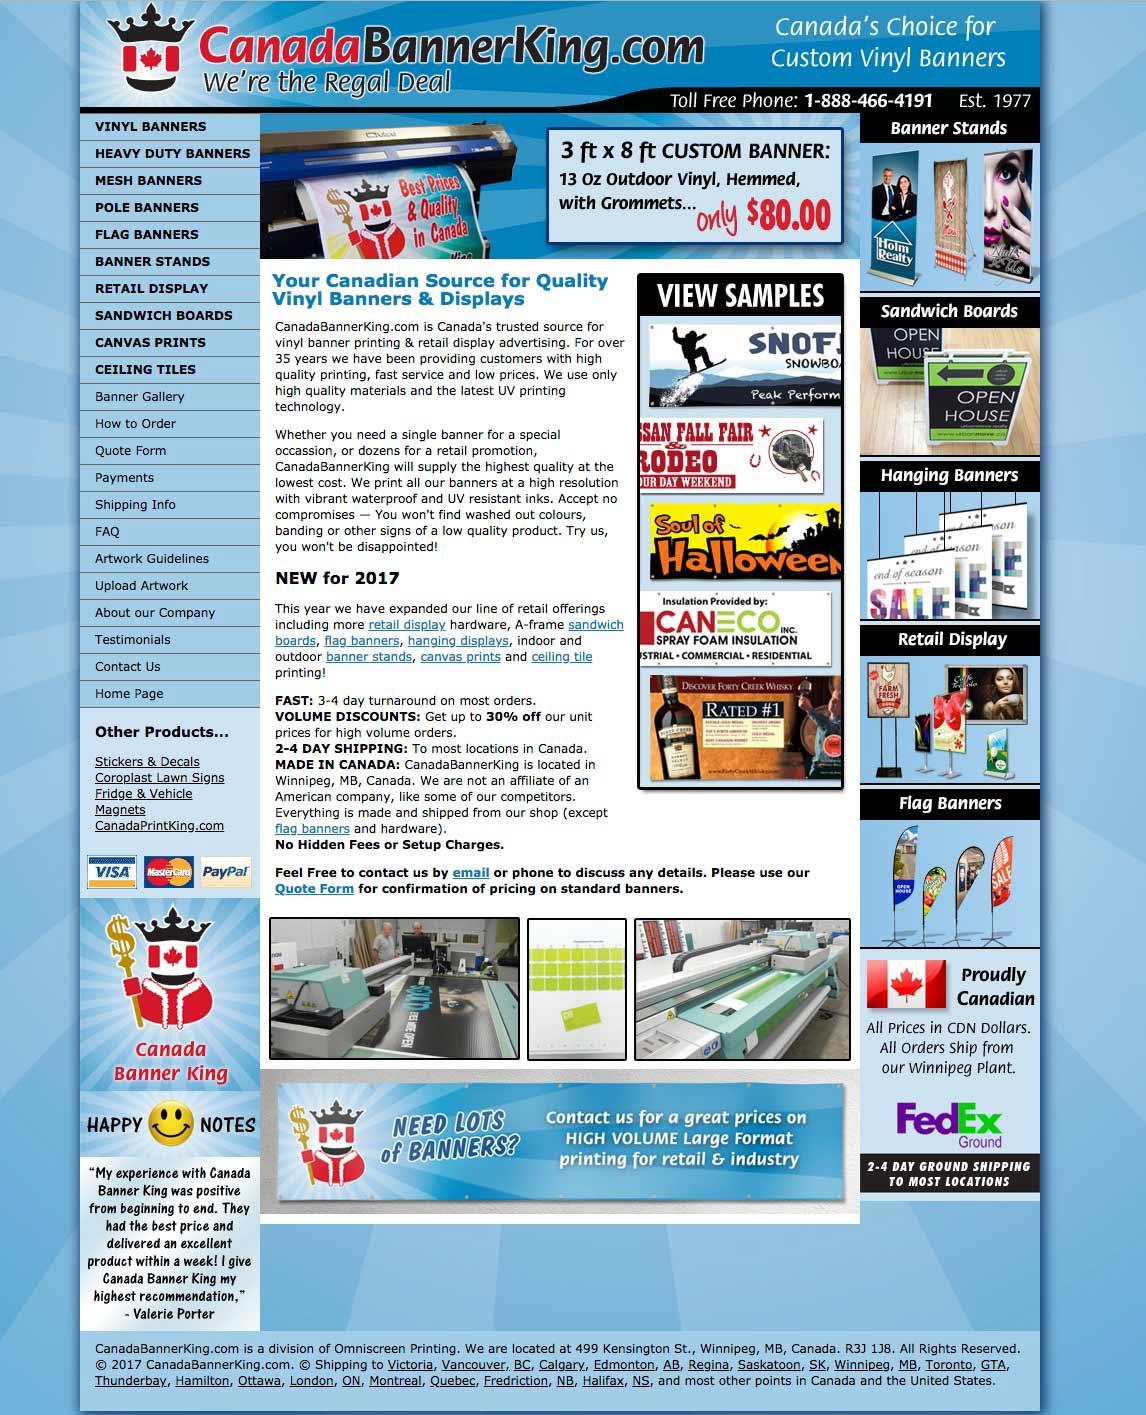 Visit CanadaBannerKing.com